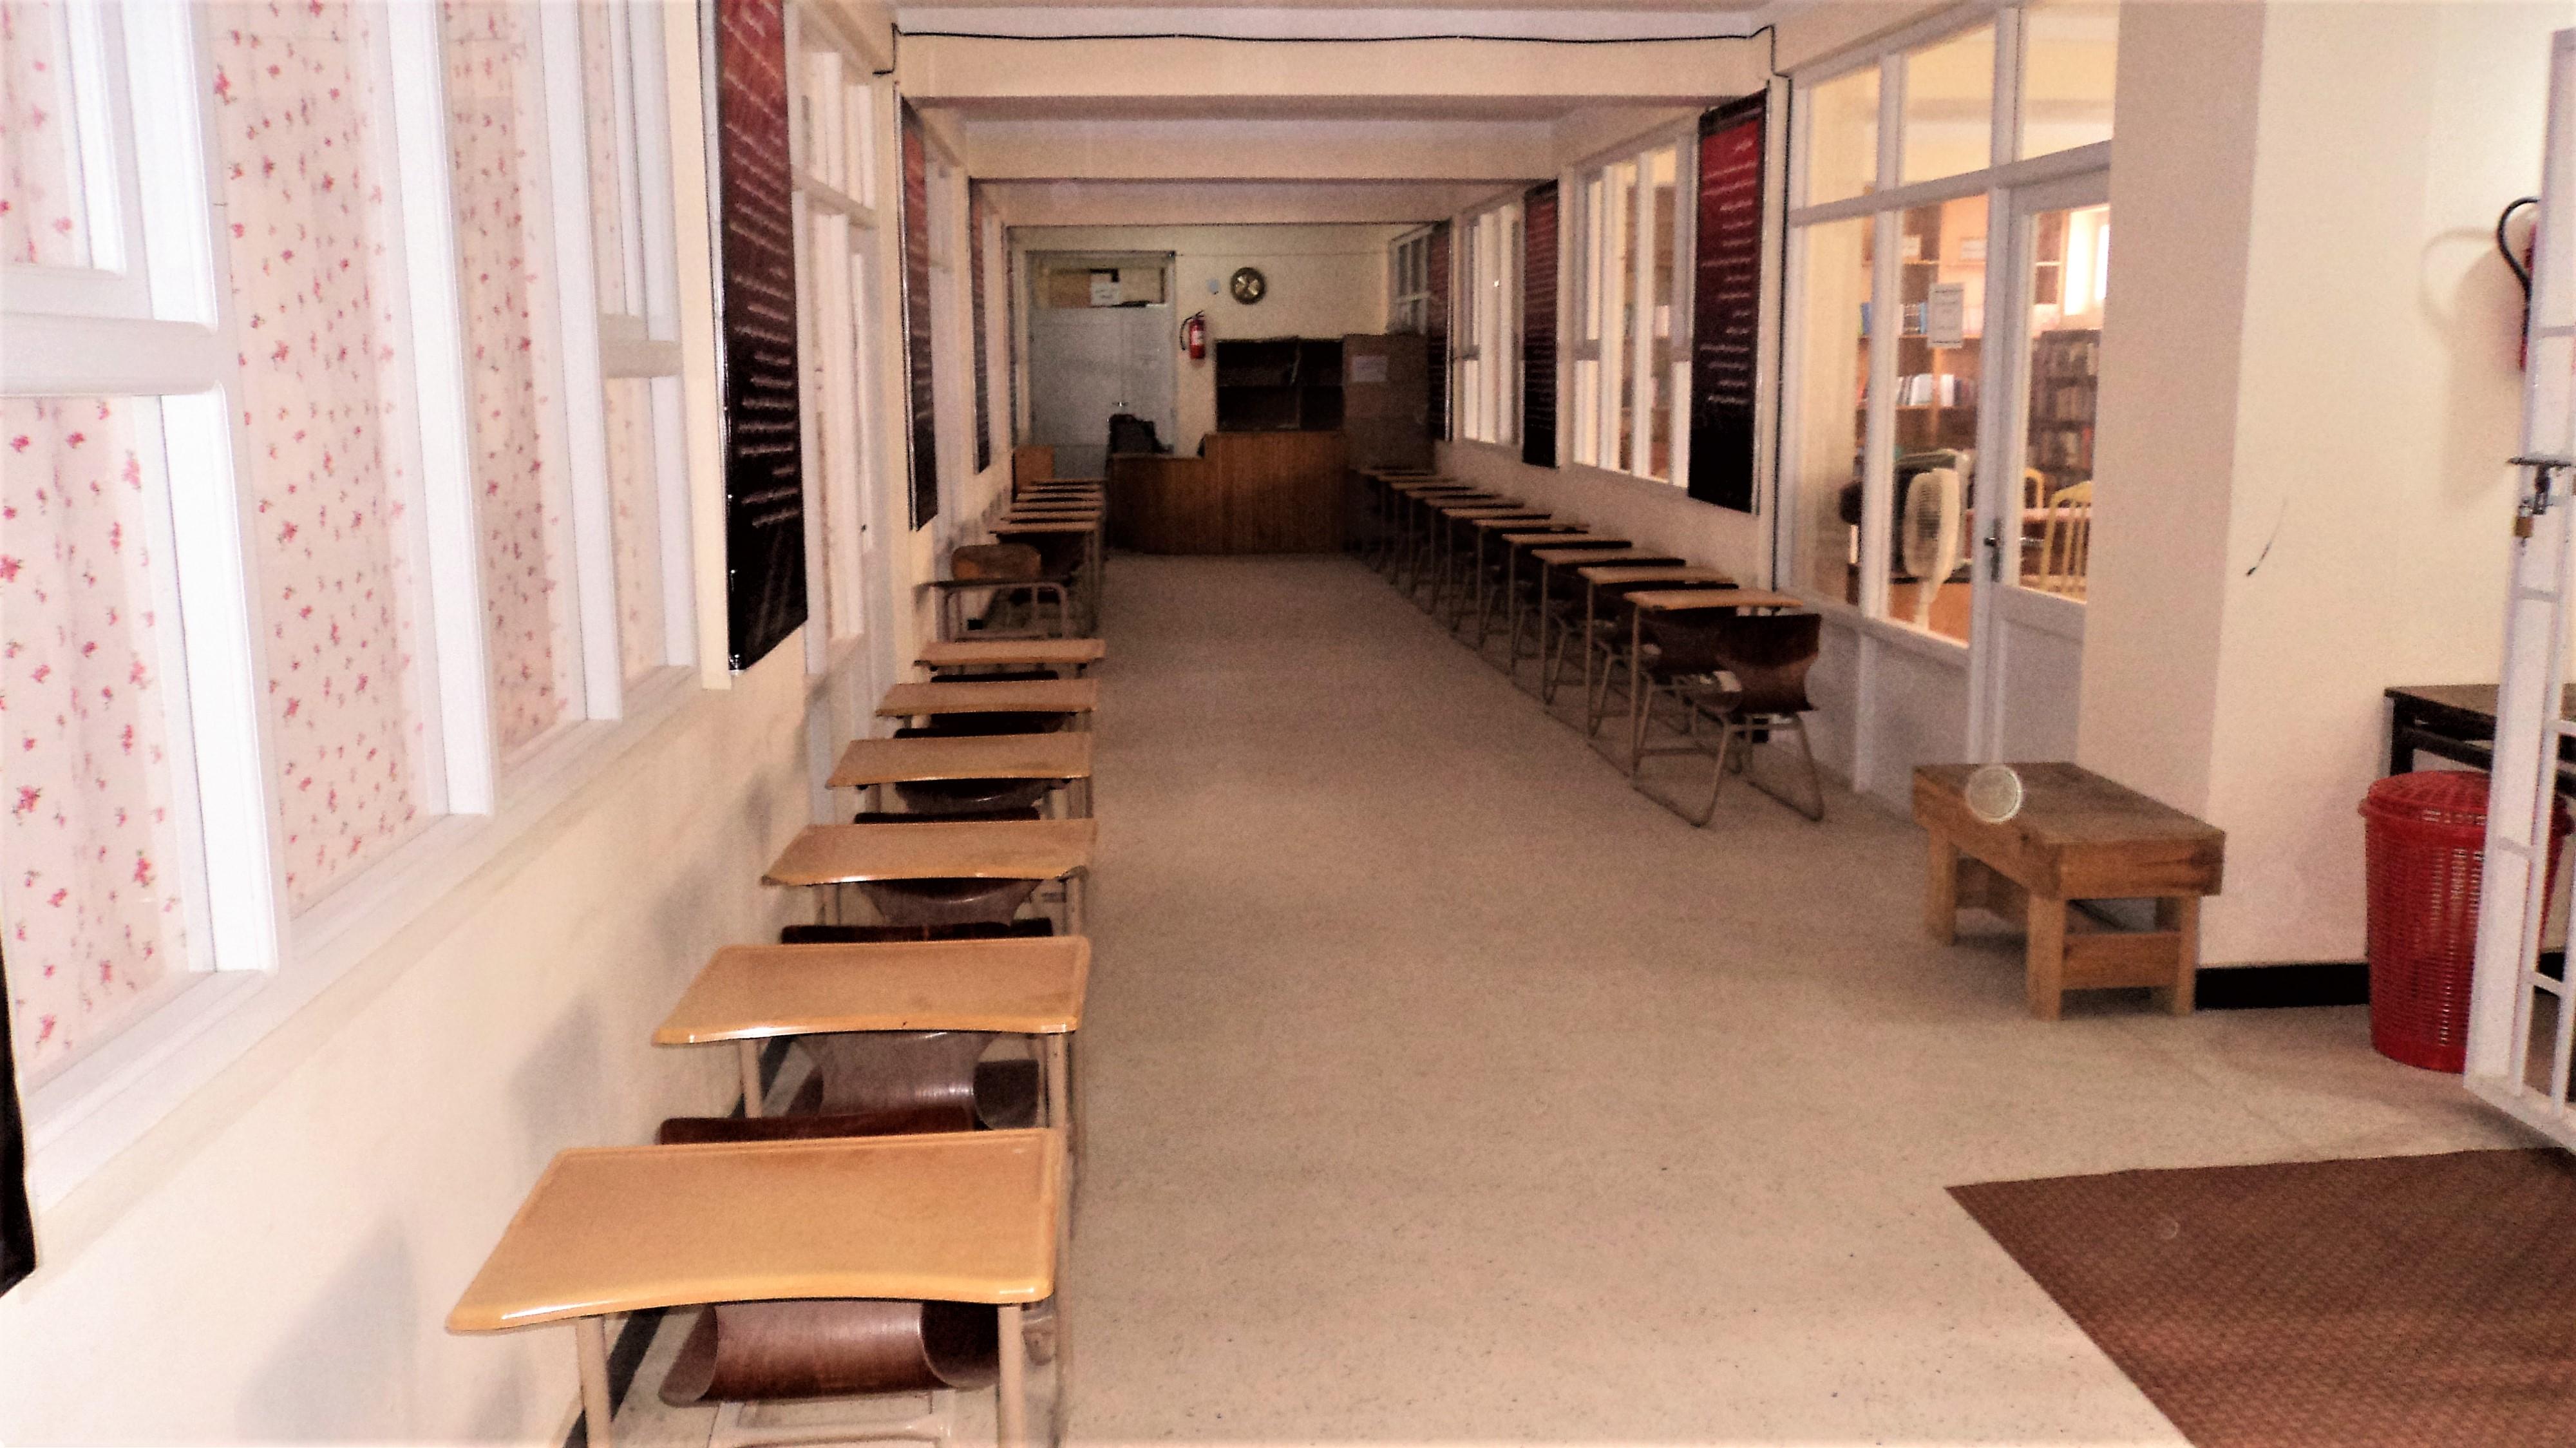 Parwan University Library